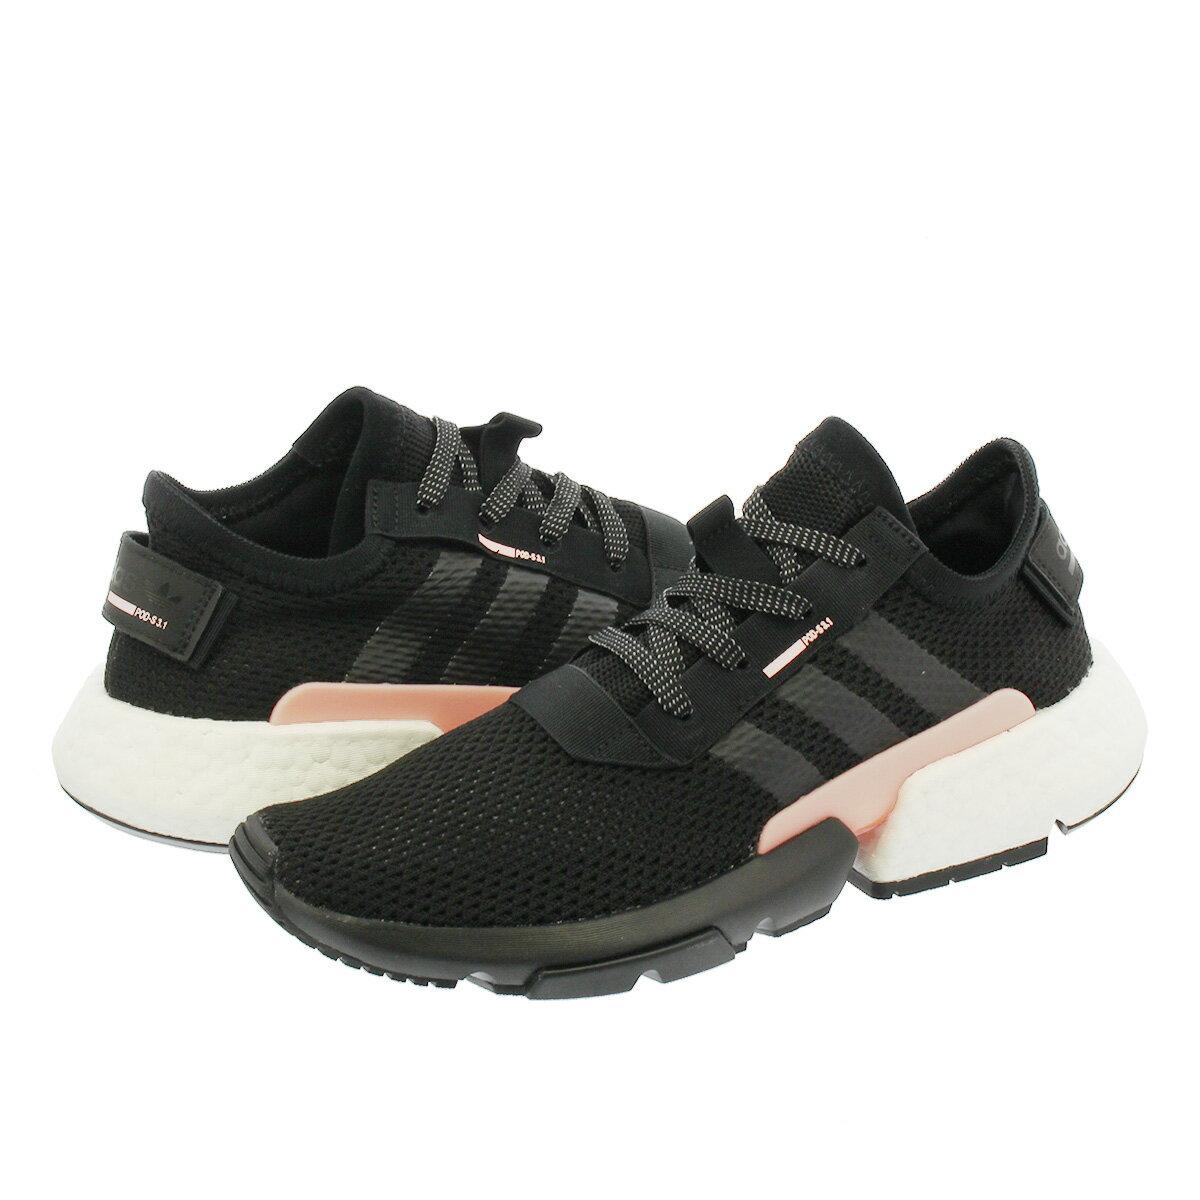 ONEYUAN Children Bears Schedule Kid Casual Lightweight Sport Shoes Sneakers Running Shoes